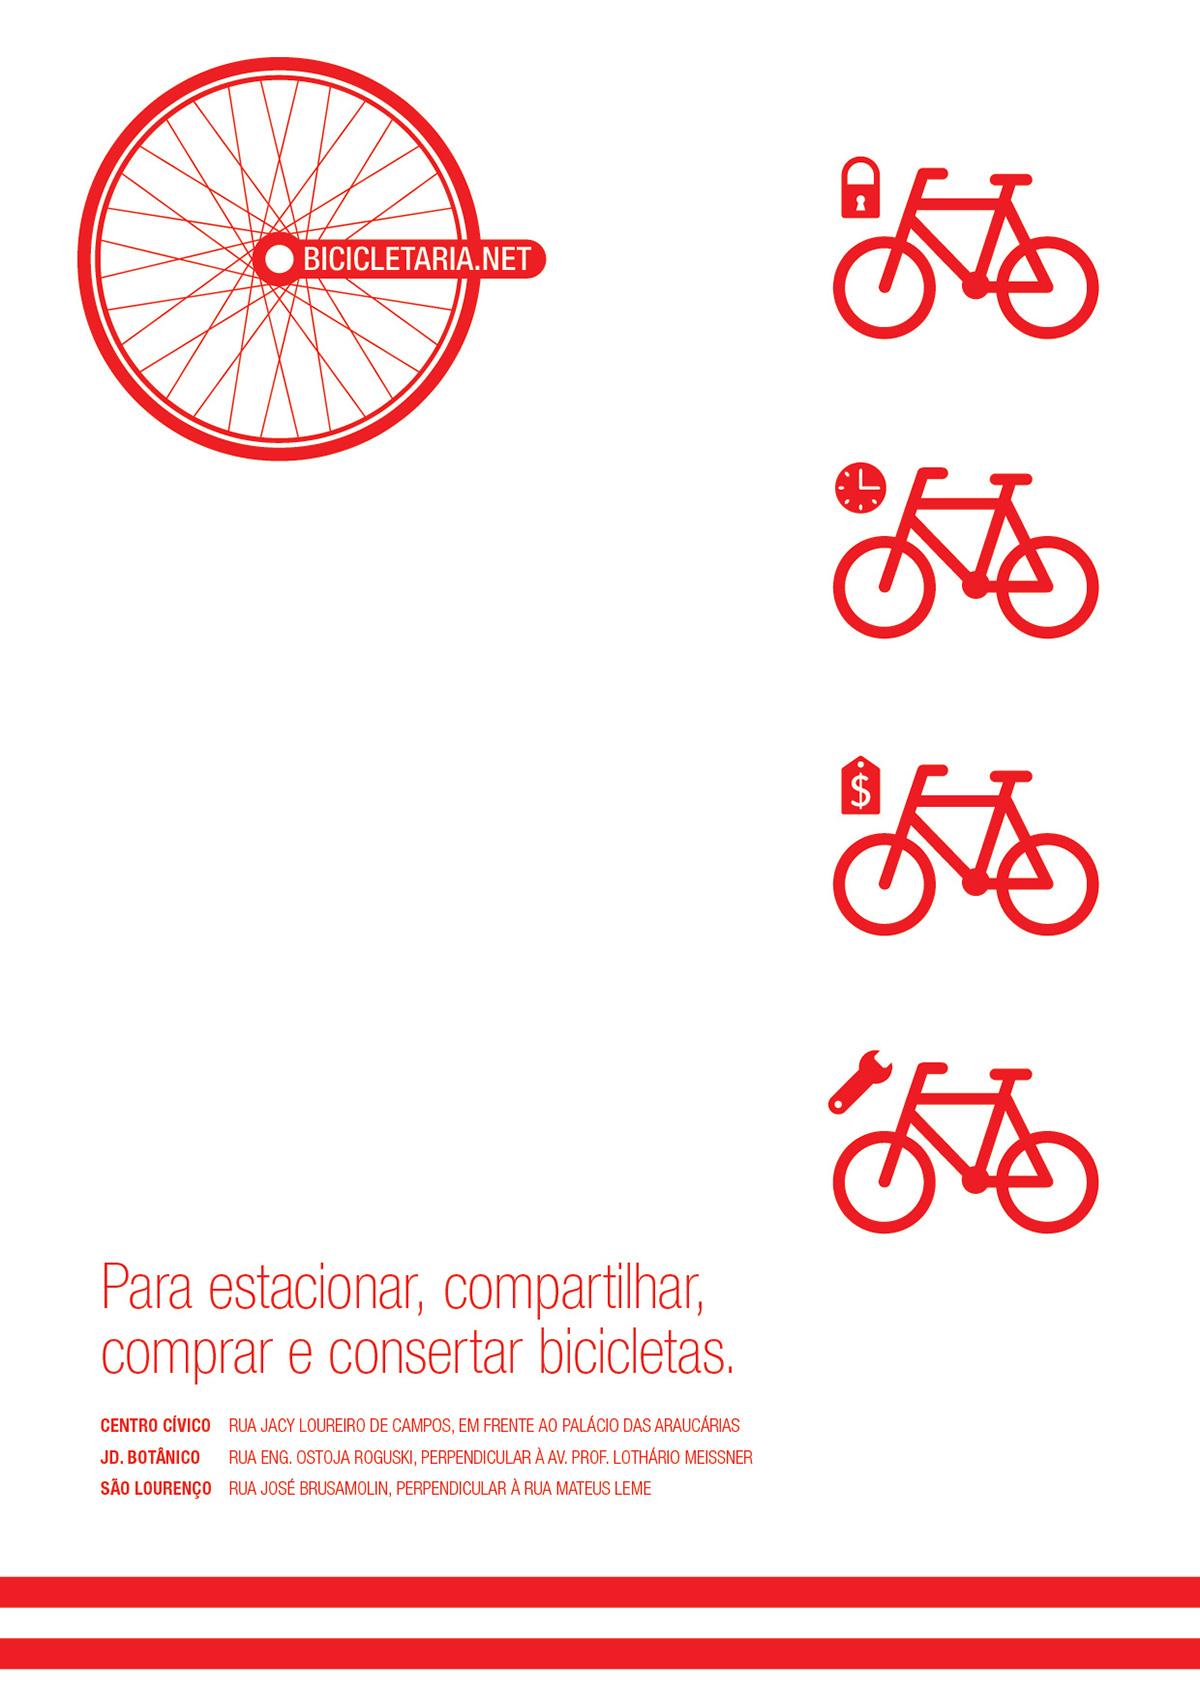 Bicycle Bike Curitiba public transport Icon signalization design signaletic mobile bike sharing